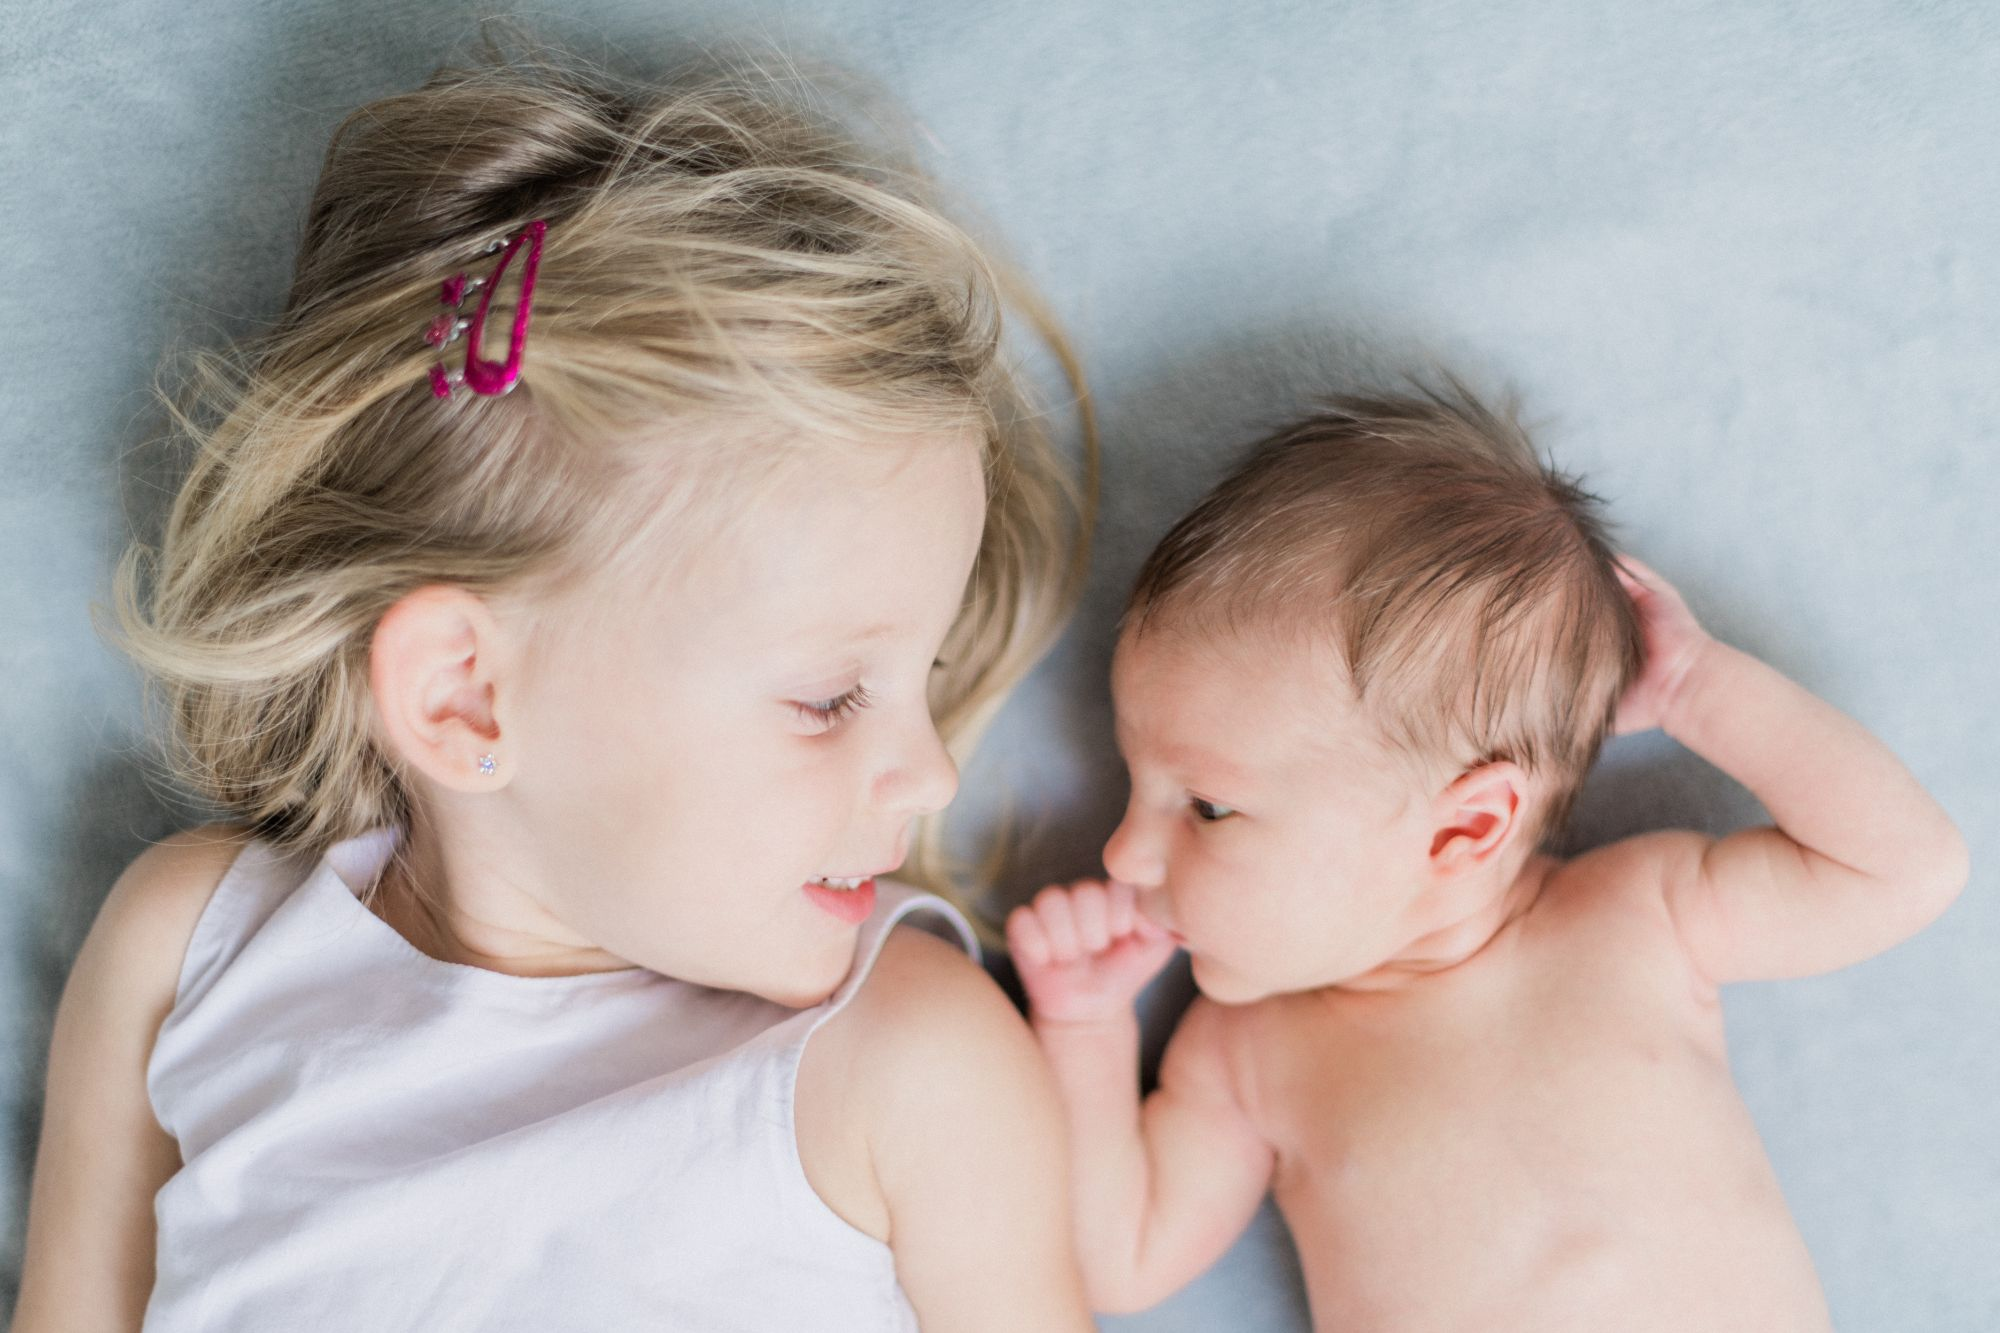 priscillapuzenat-photographe-famille-naissance-maternite-bebe-sens-yonne-bourgogne-france